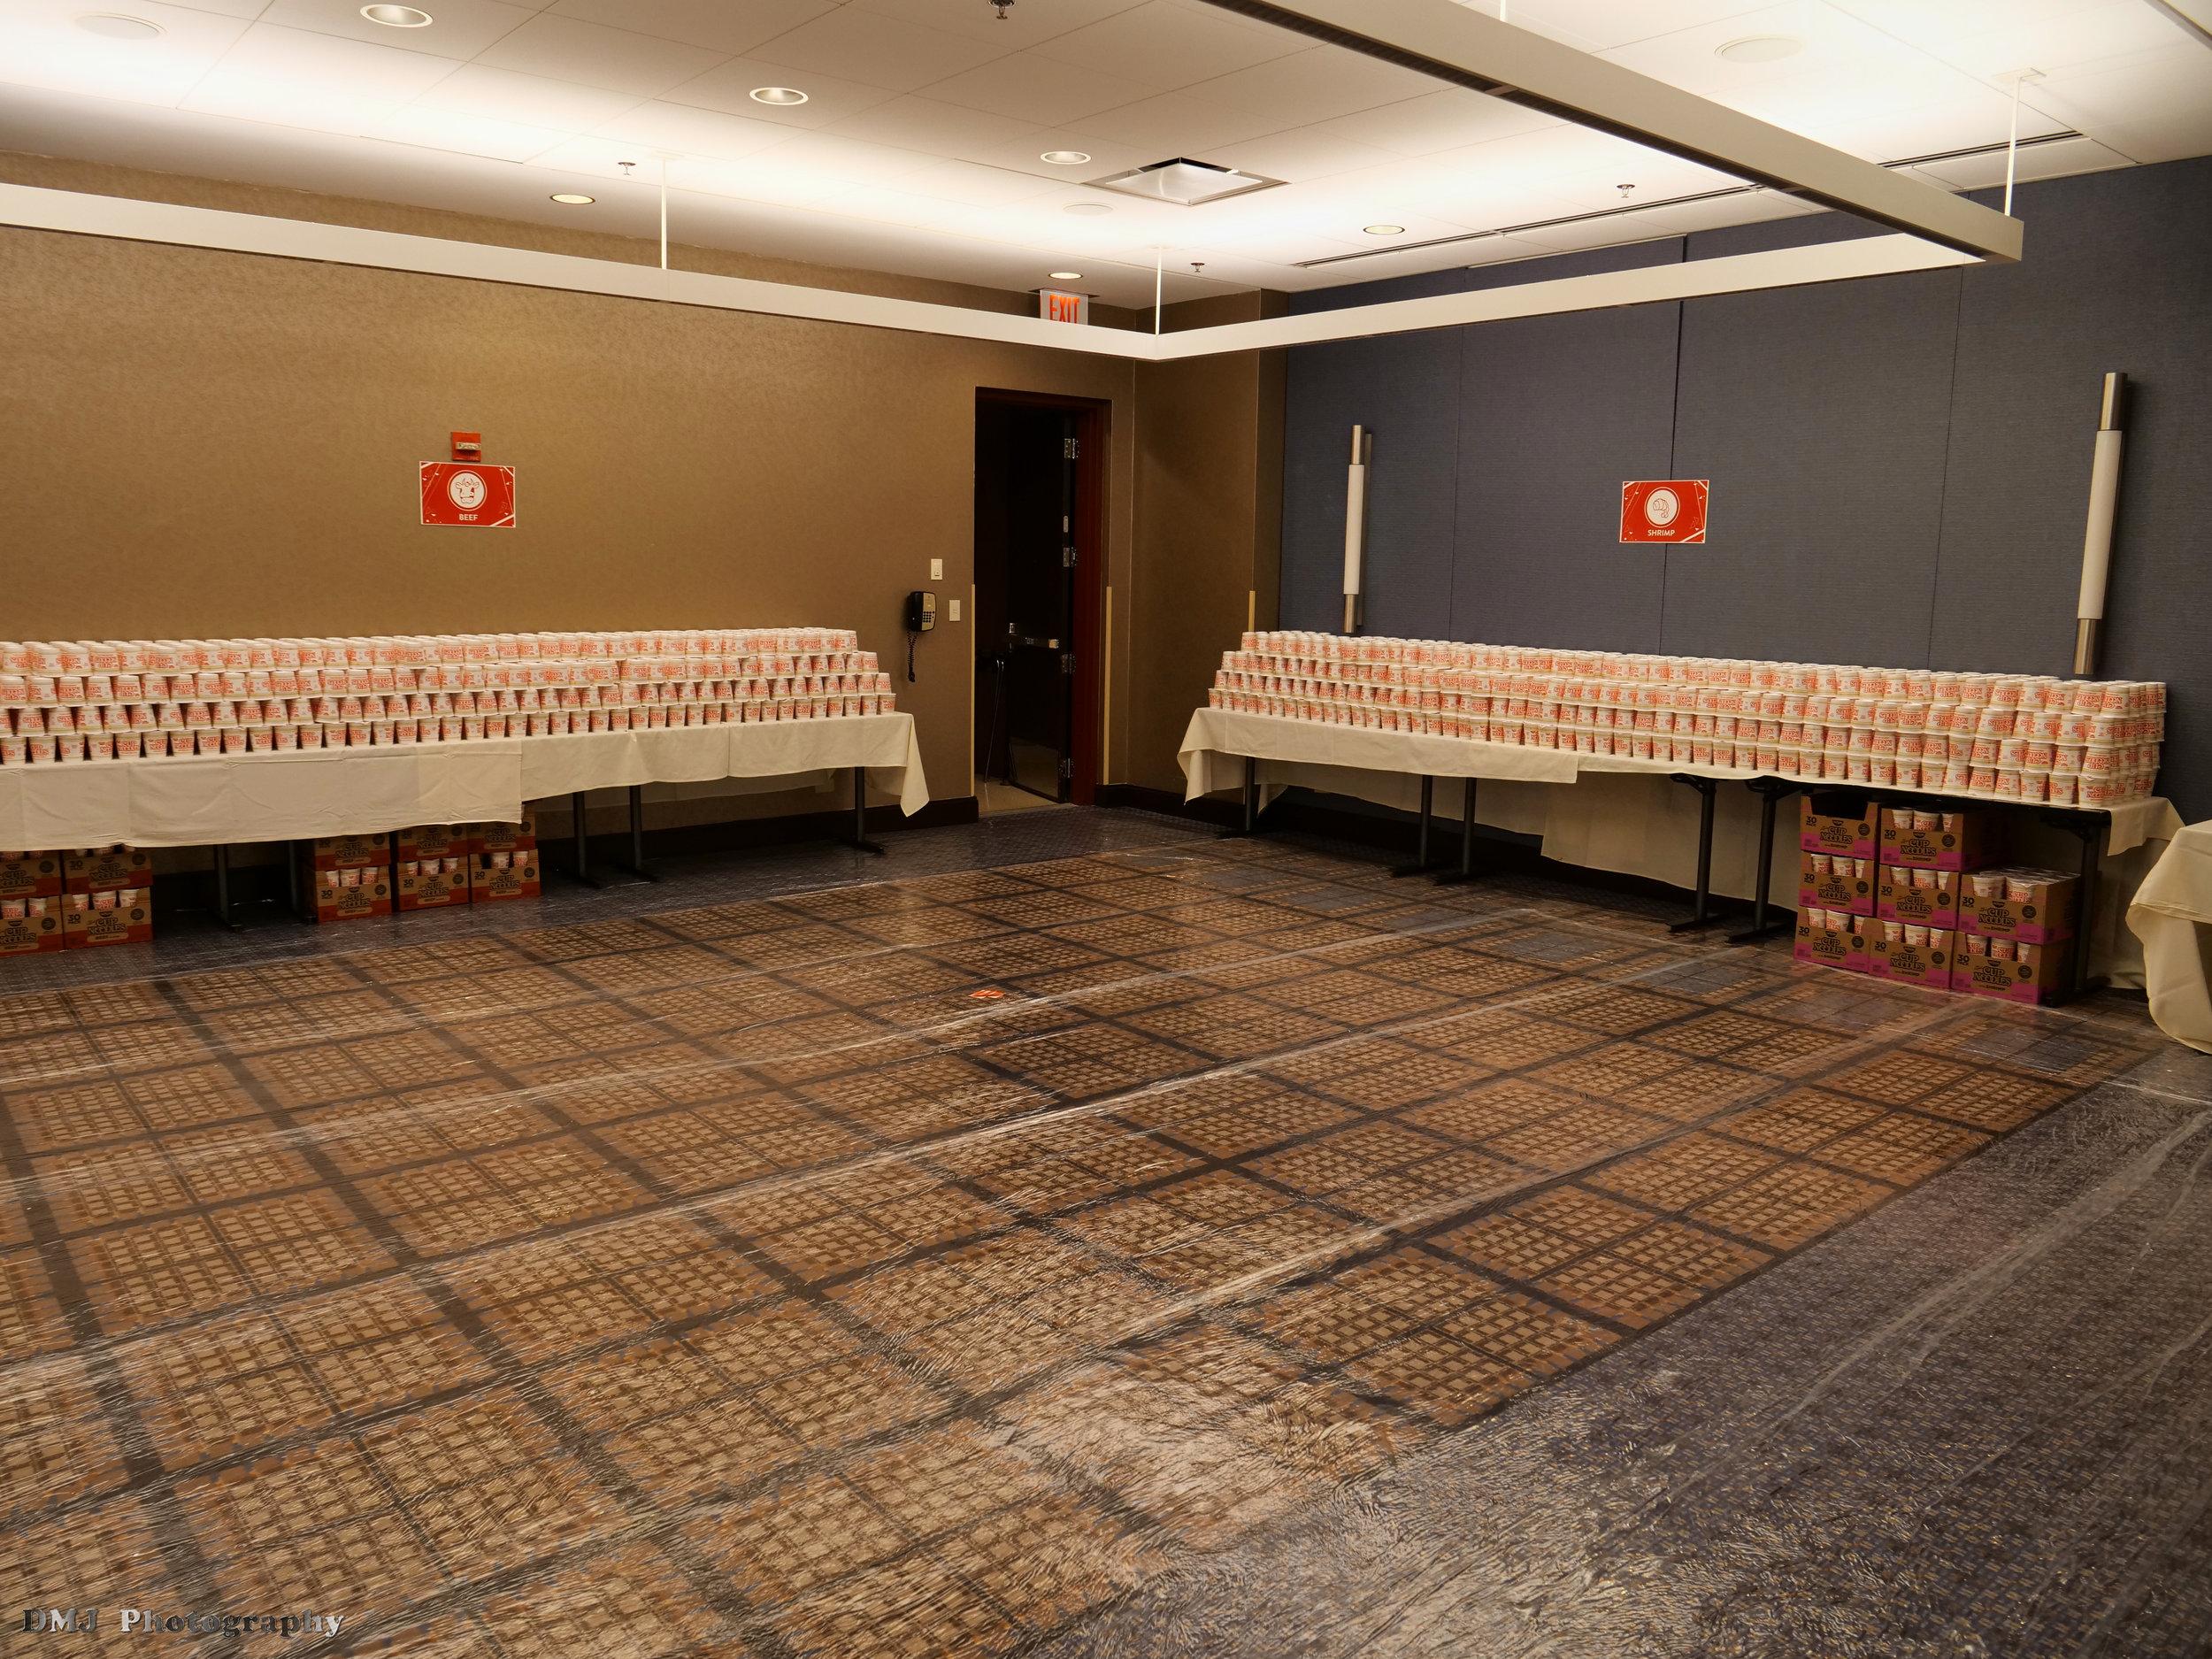 Tables of ramen